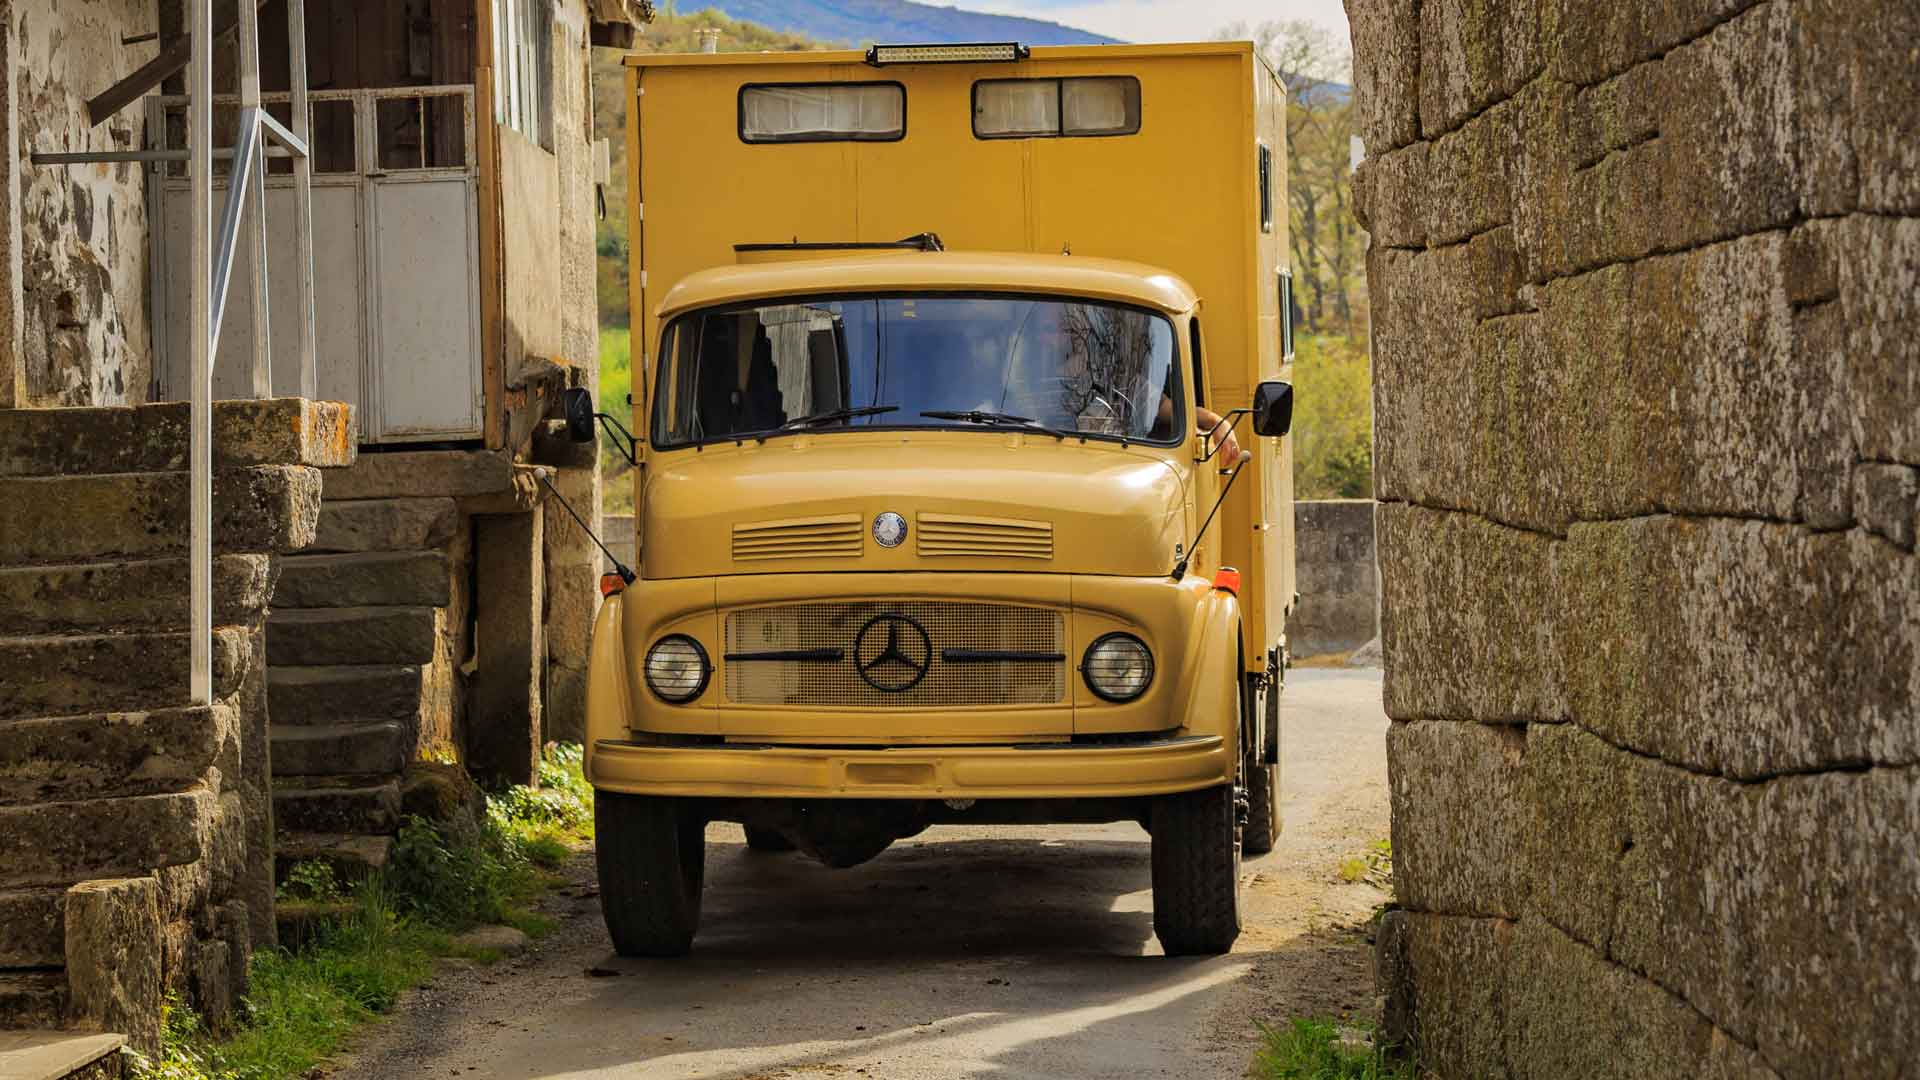 Wohnmobil Reiseberichte